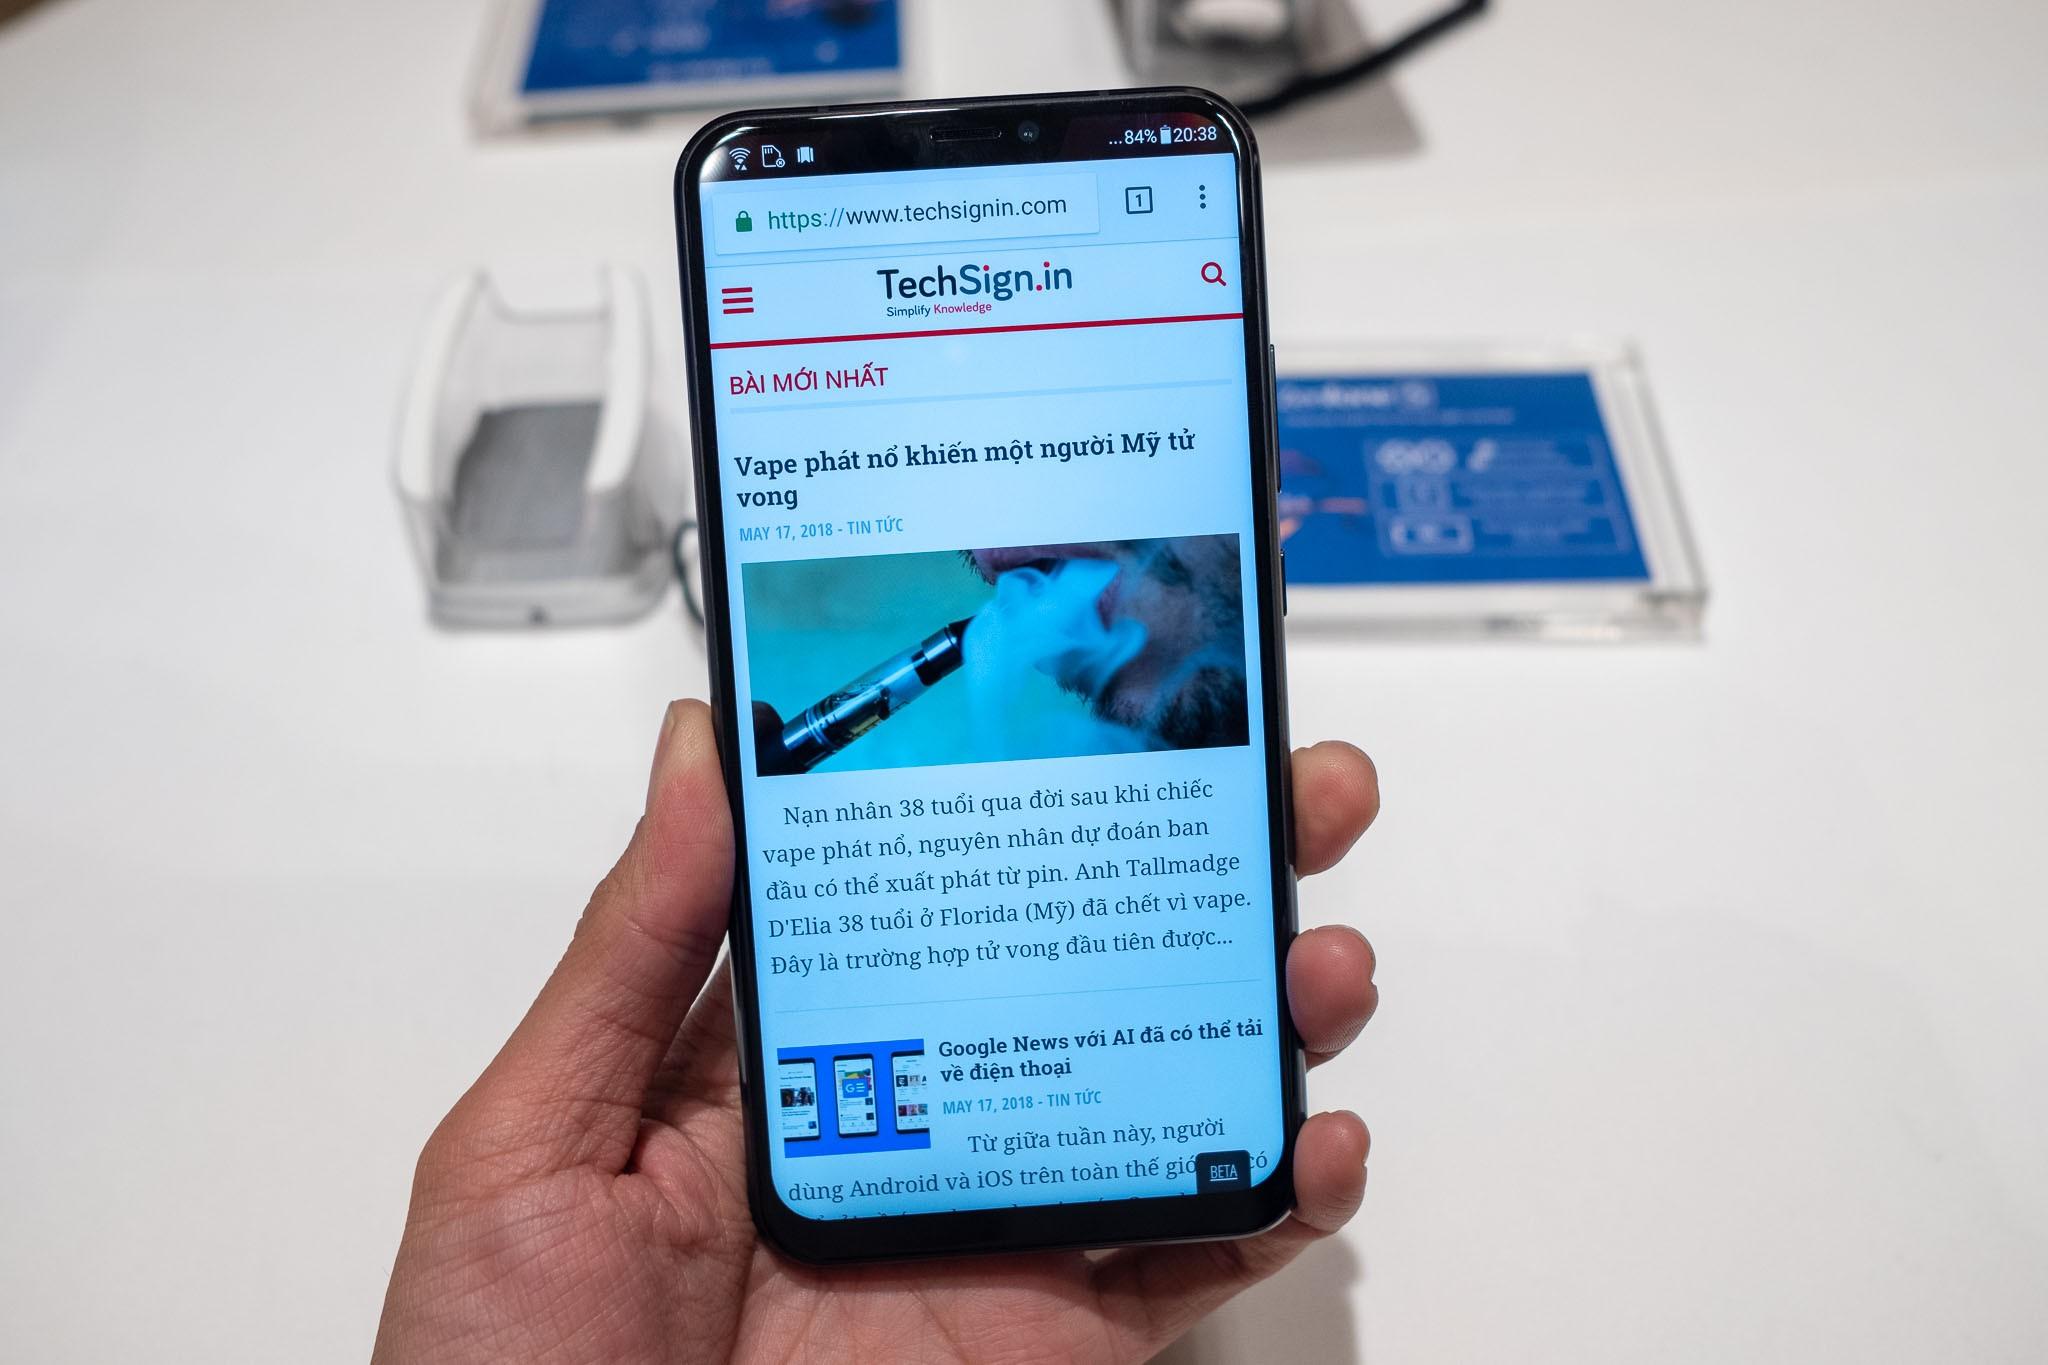 Asus ra mắt Zenfone 5 tích hợp AI